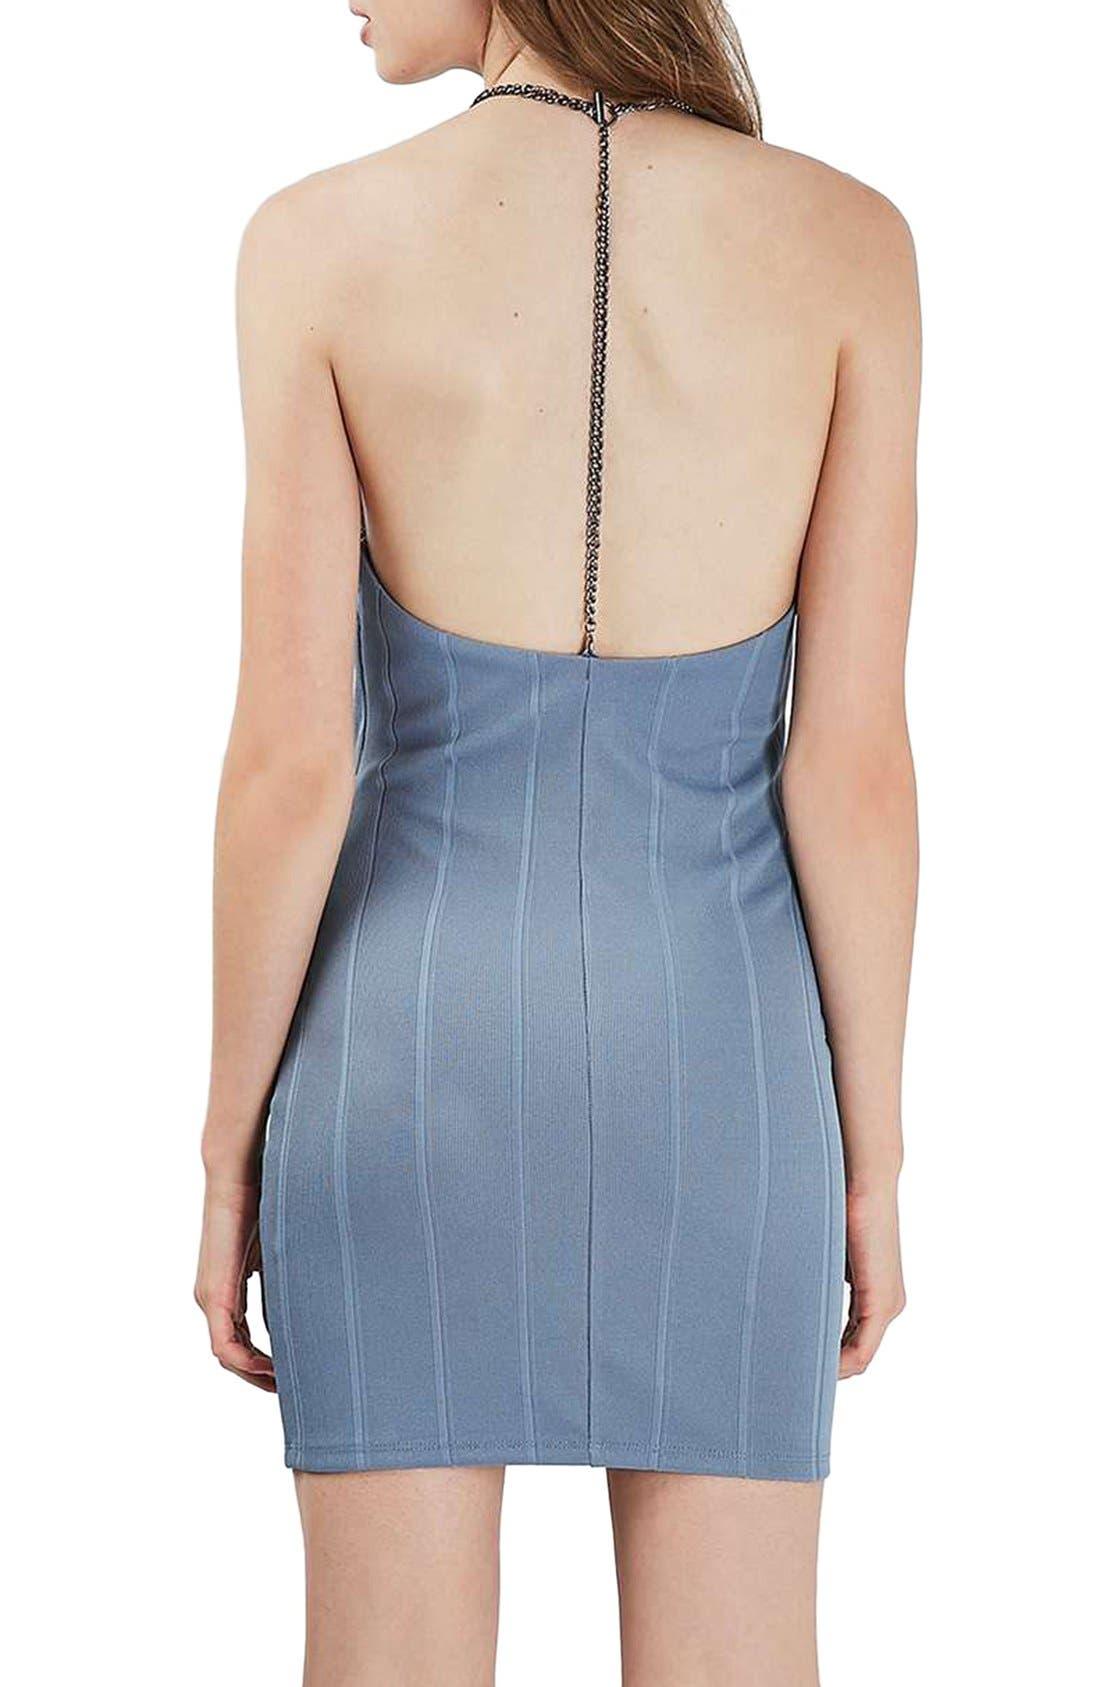 Alternate Image 2  - Topshop Chain Strap Bandage Body-Con Dress